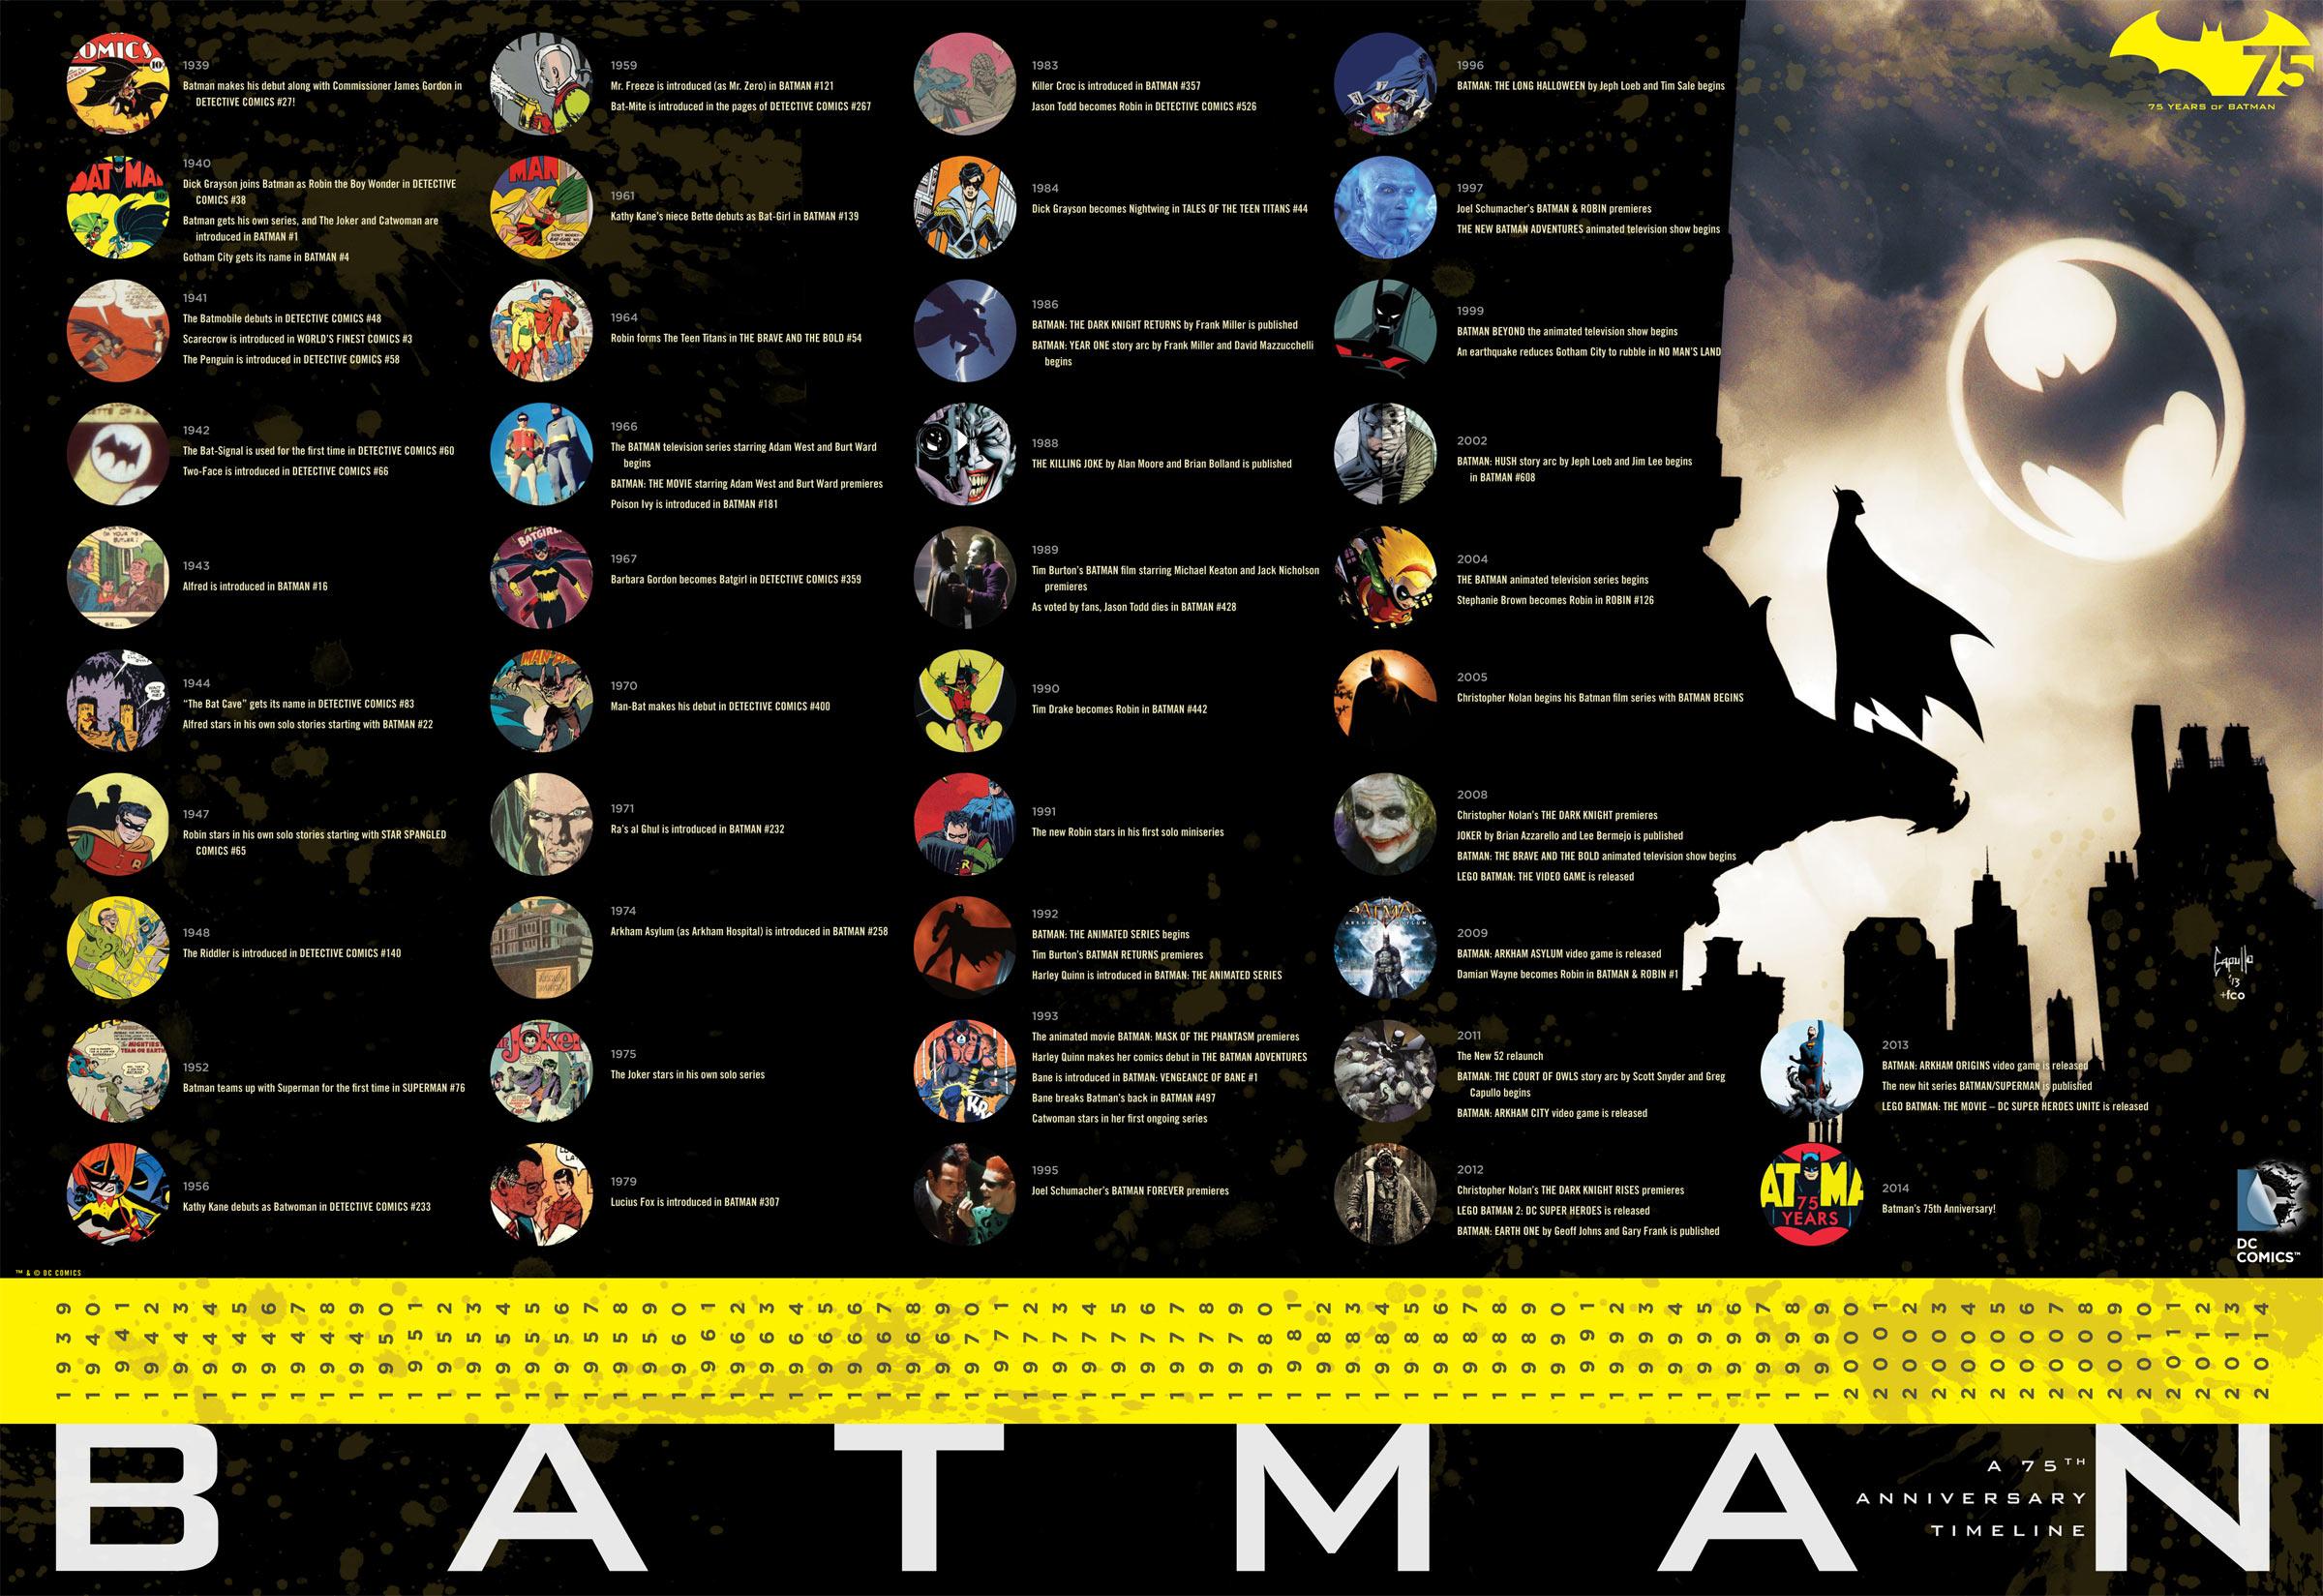 gothamtvpodcast@gmail com, Author at Gotham TV Podcast